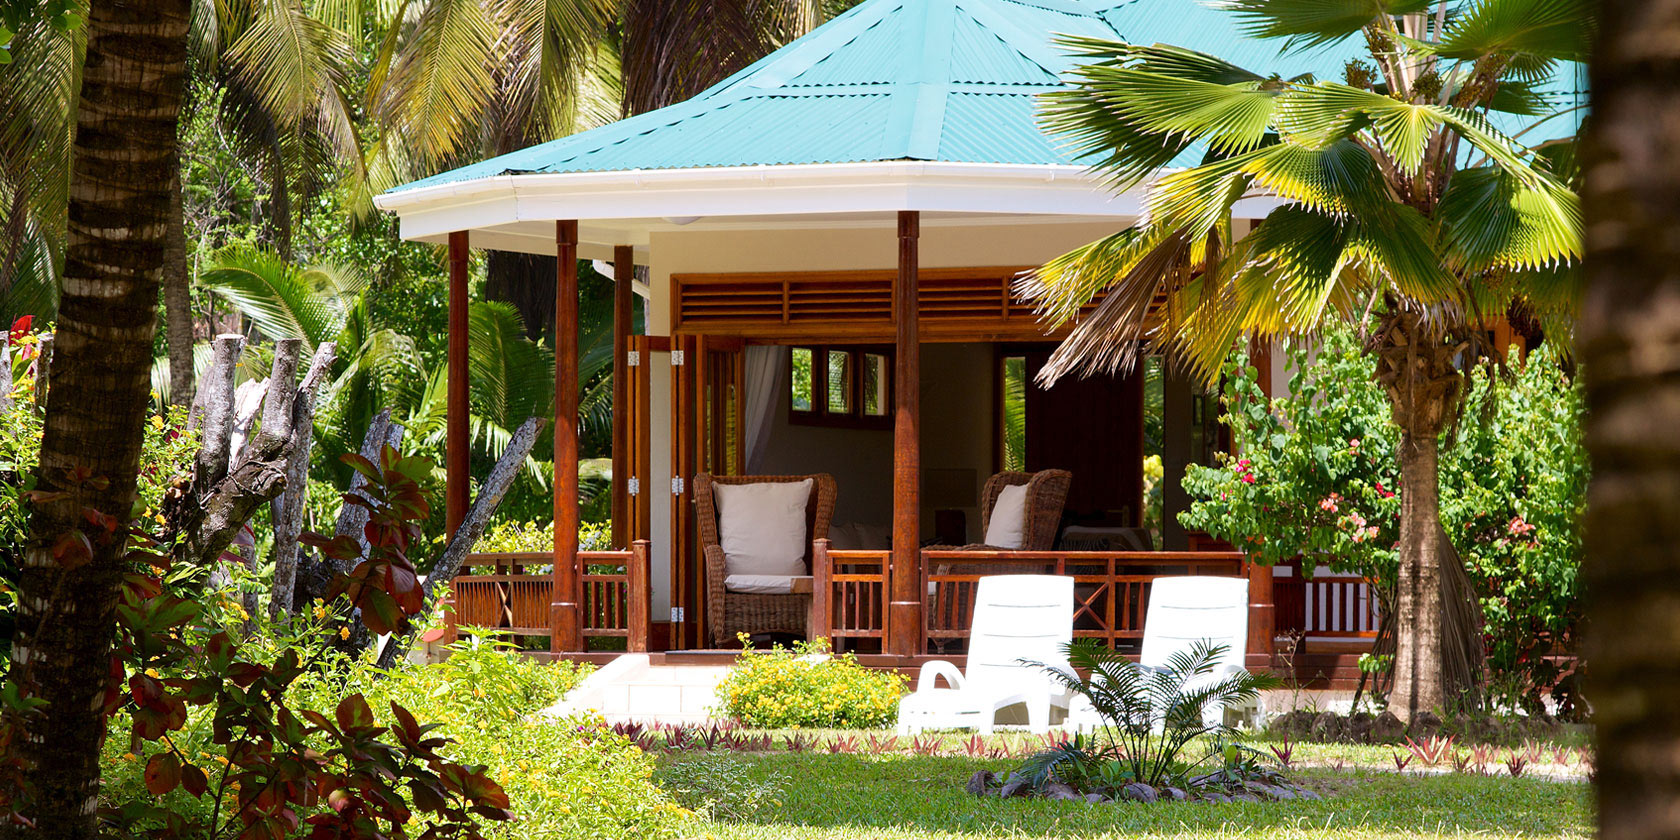 Hotels in Seychelles